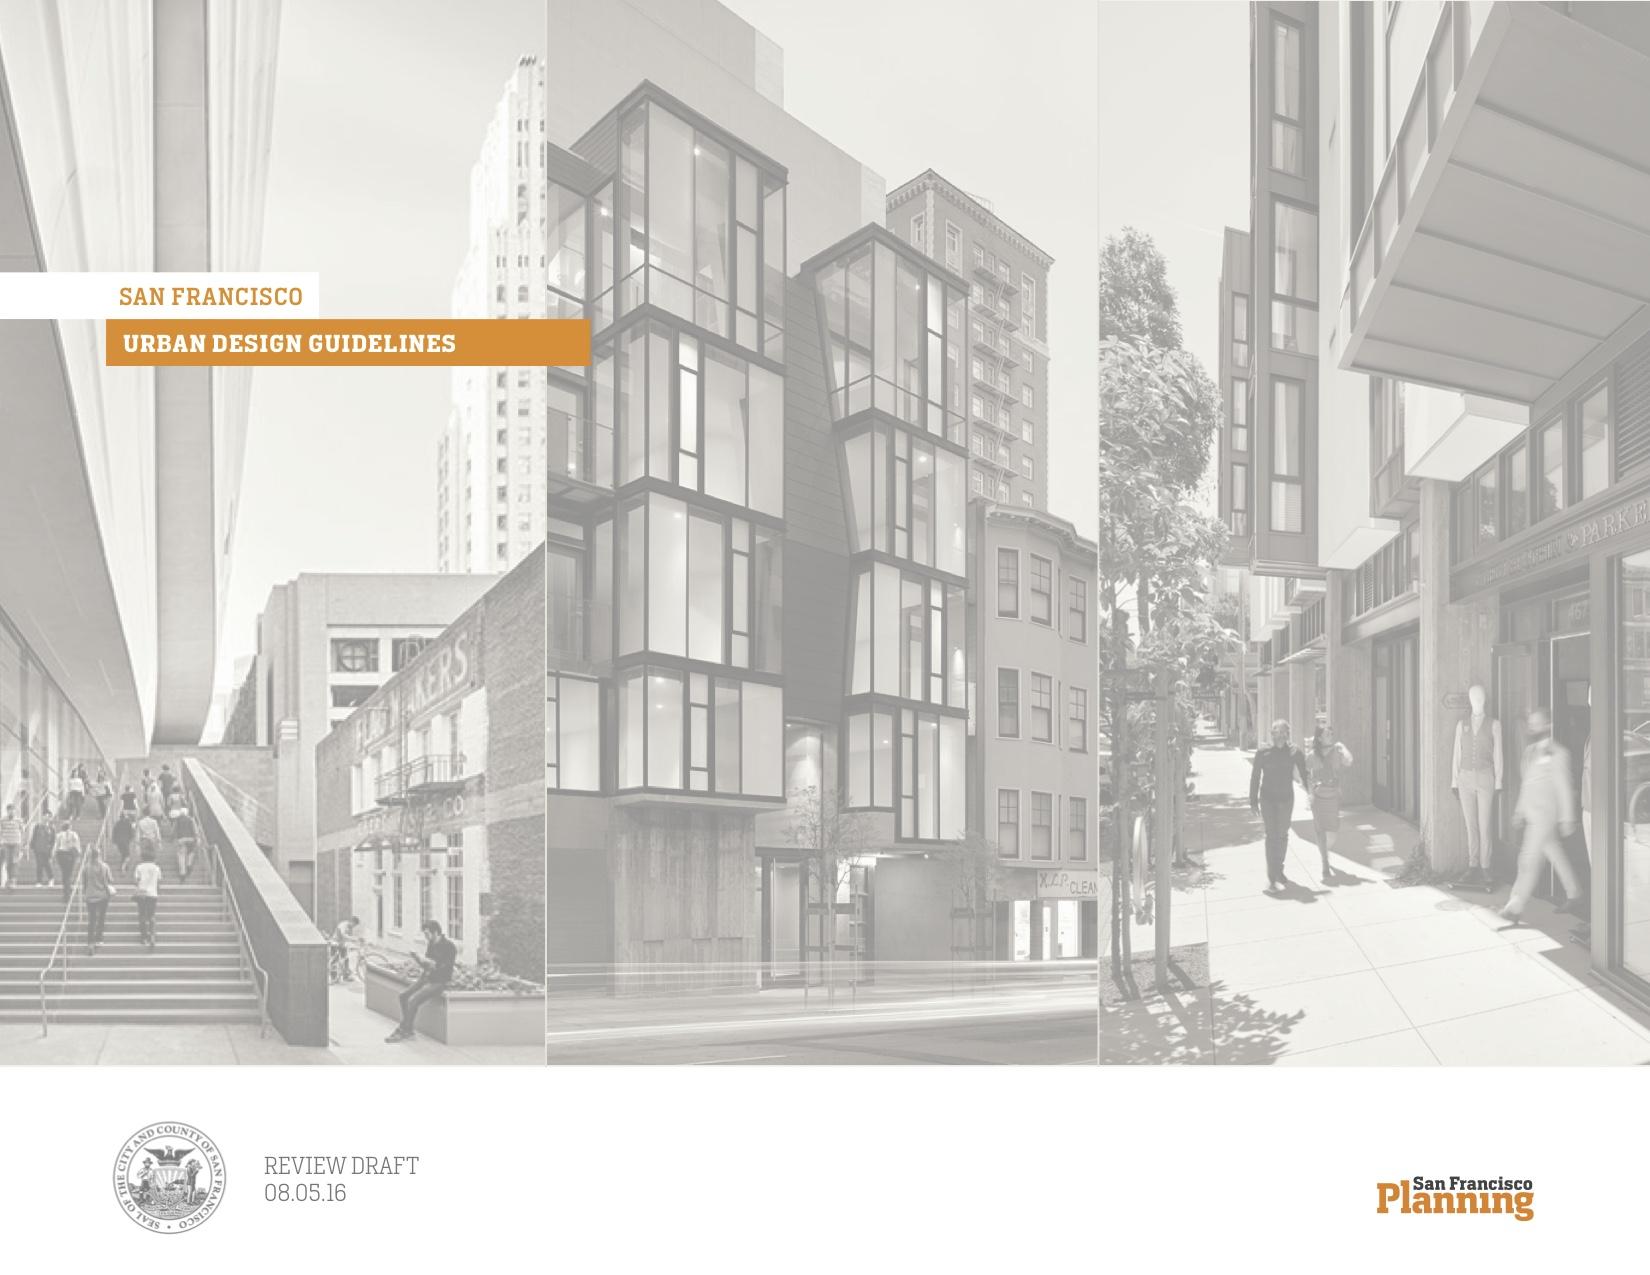 Urban Design Guidelines_REVIEW 2__nodraft 1 (1).jpg